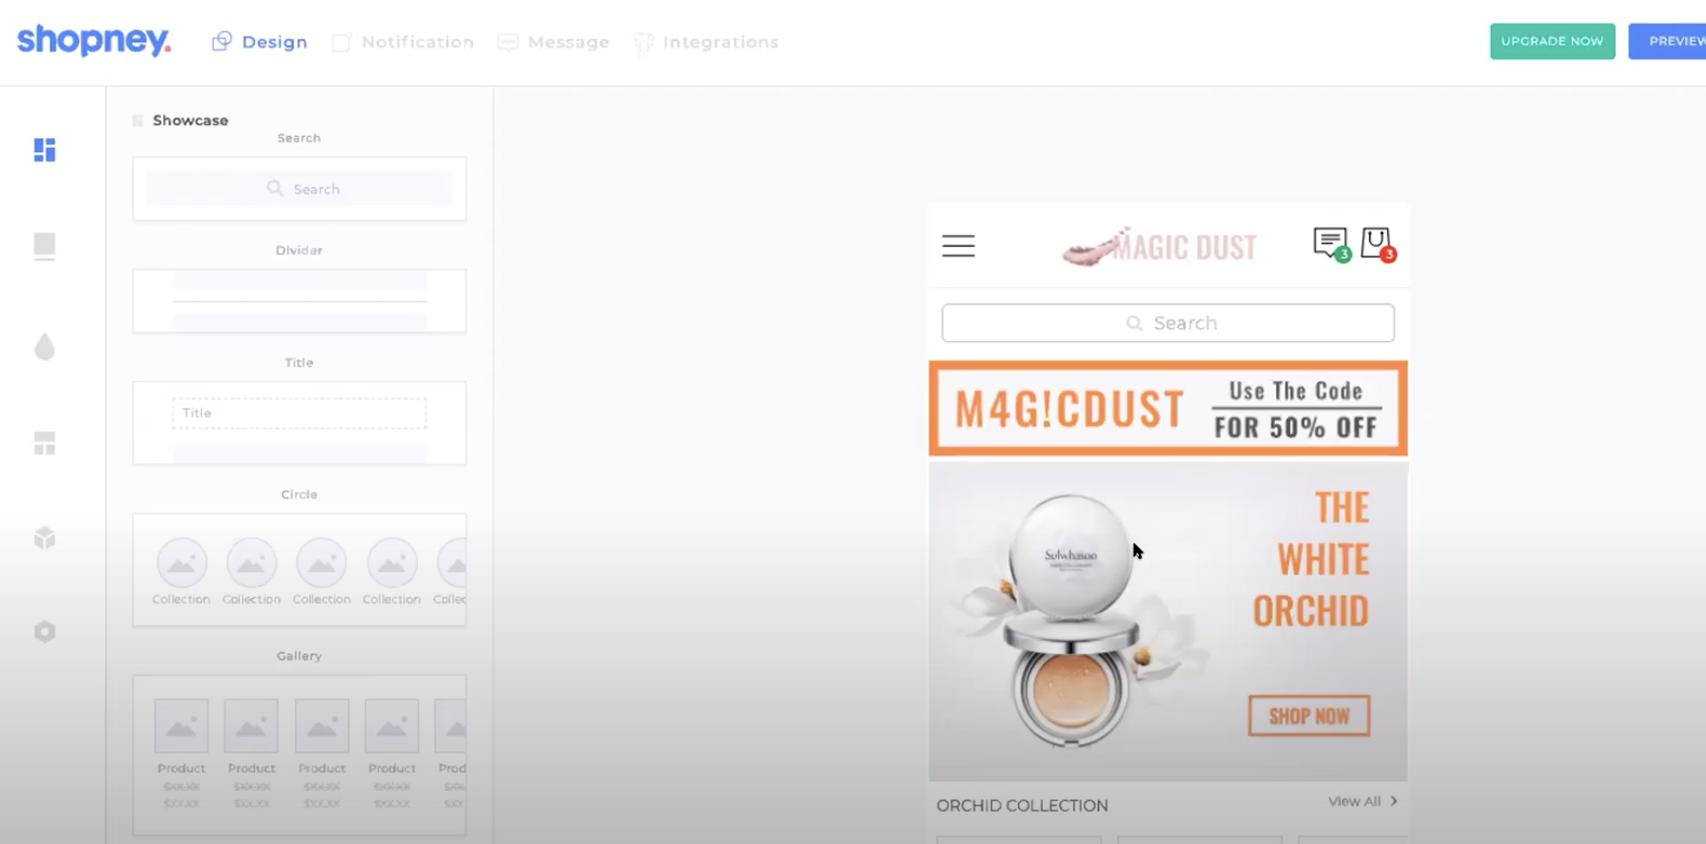 Shopney_Homepage Design